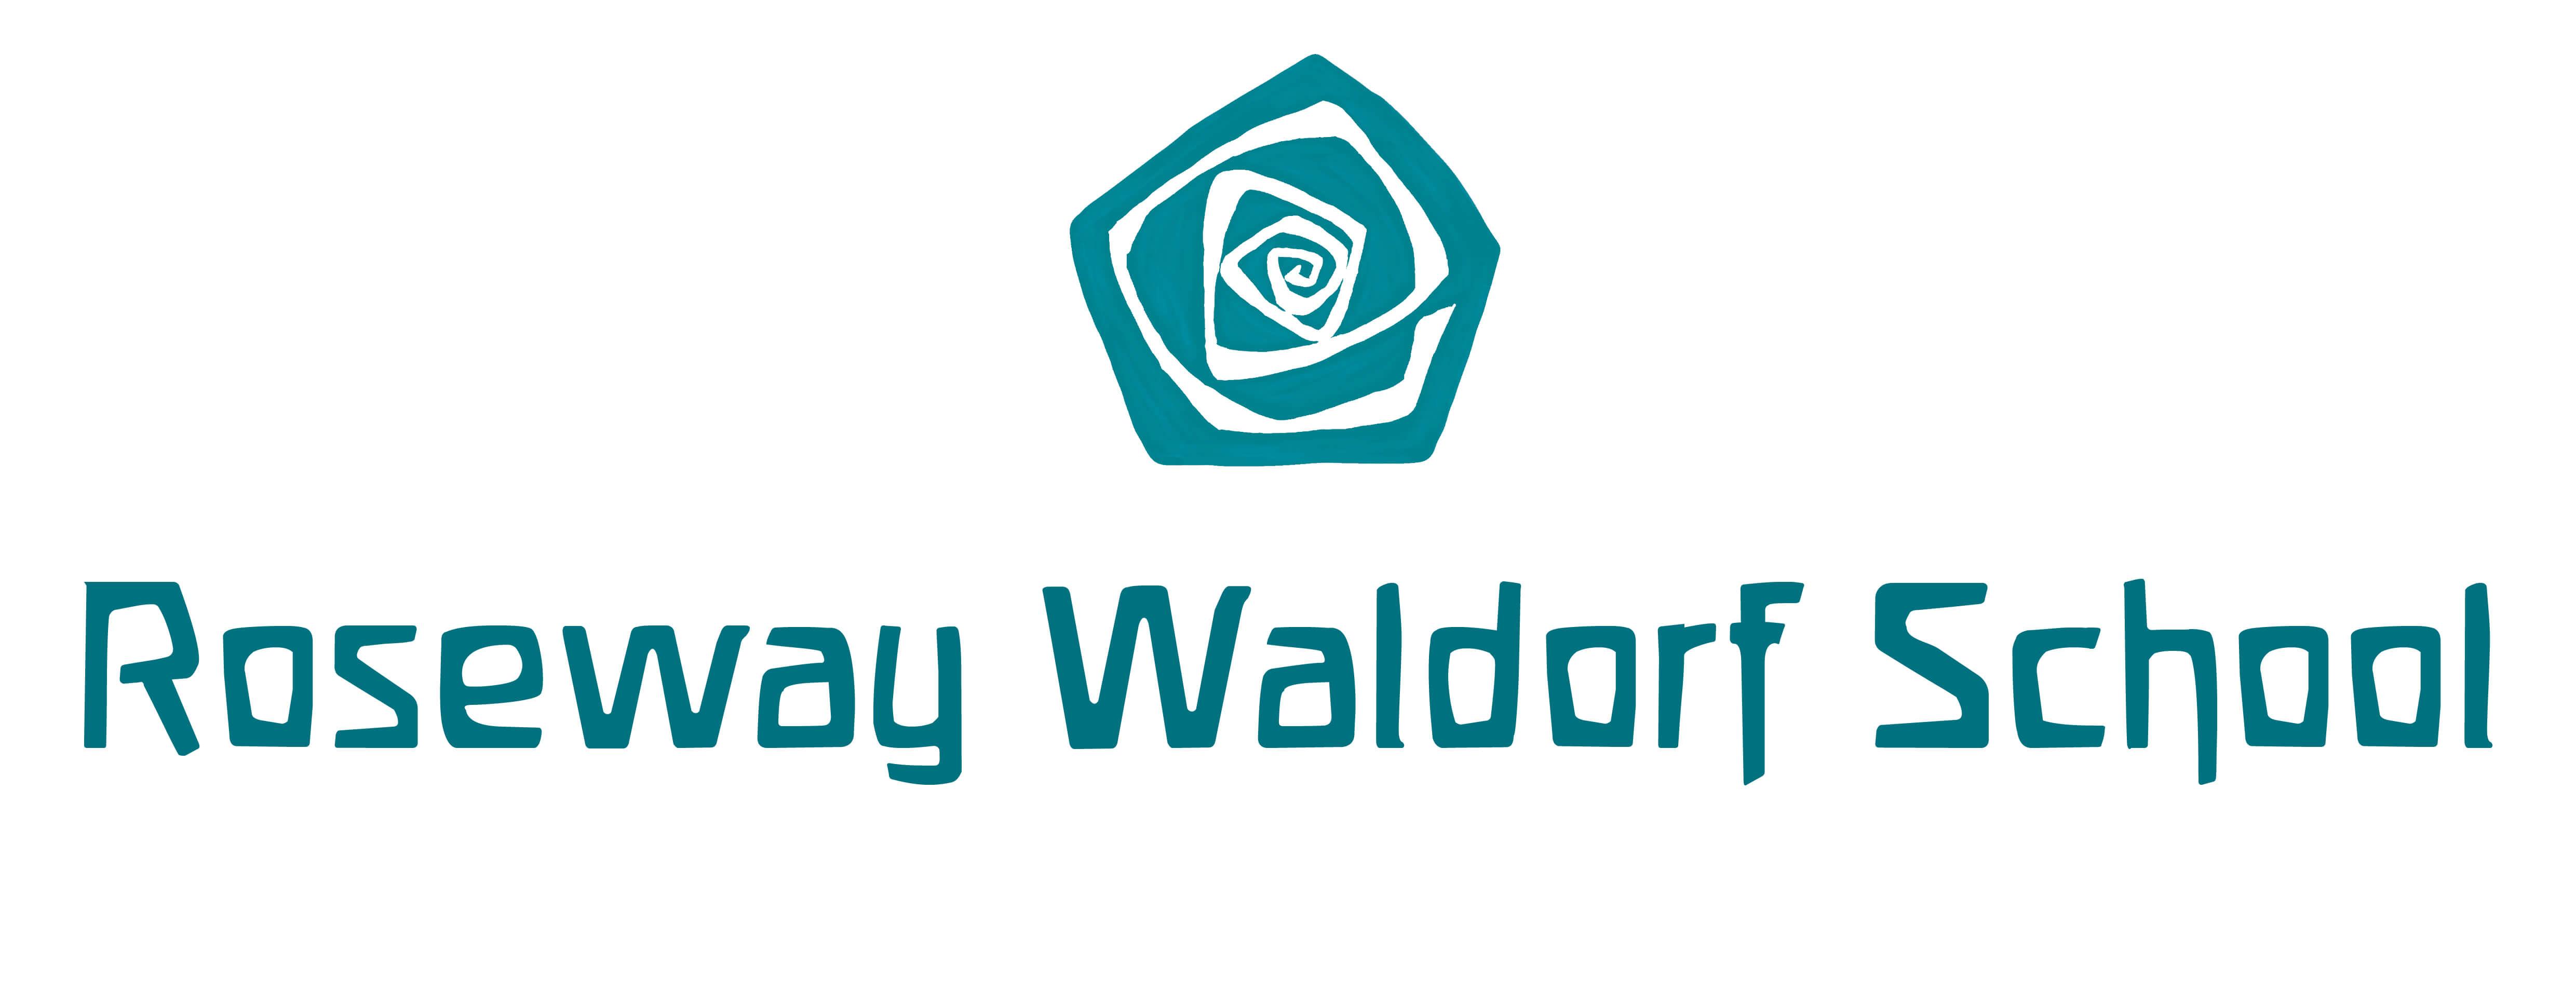 Roseway Waldorf School